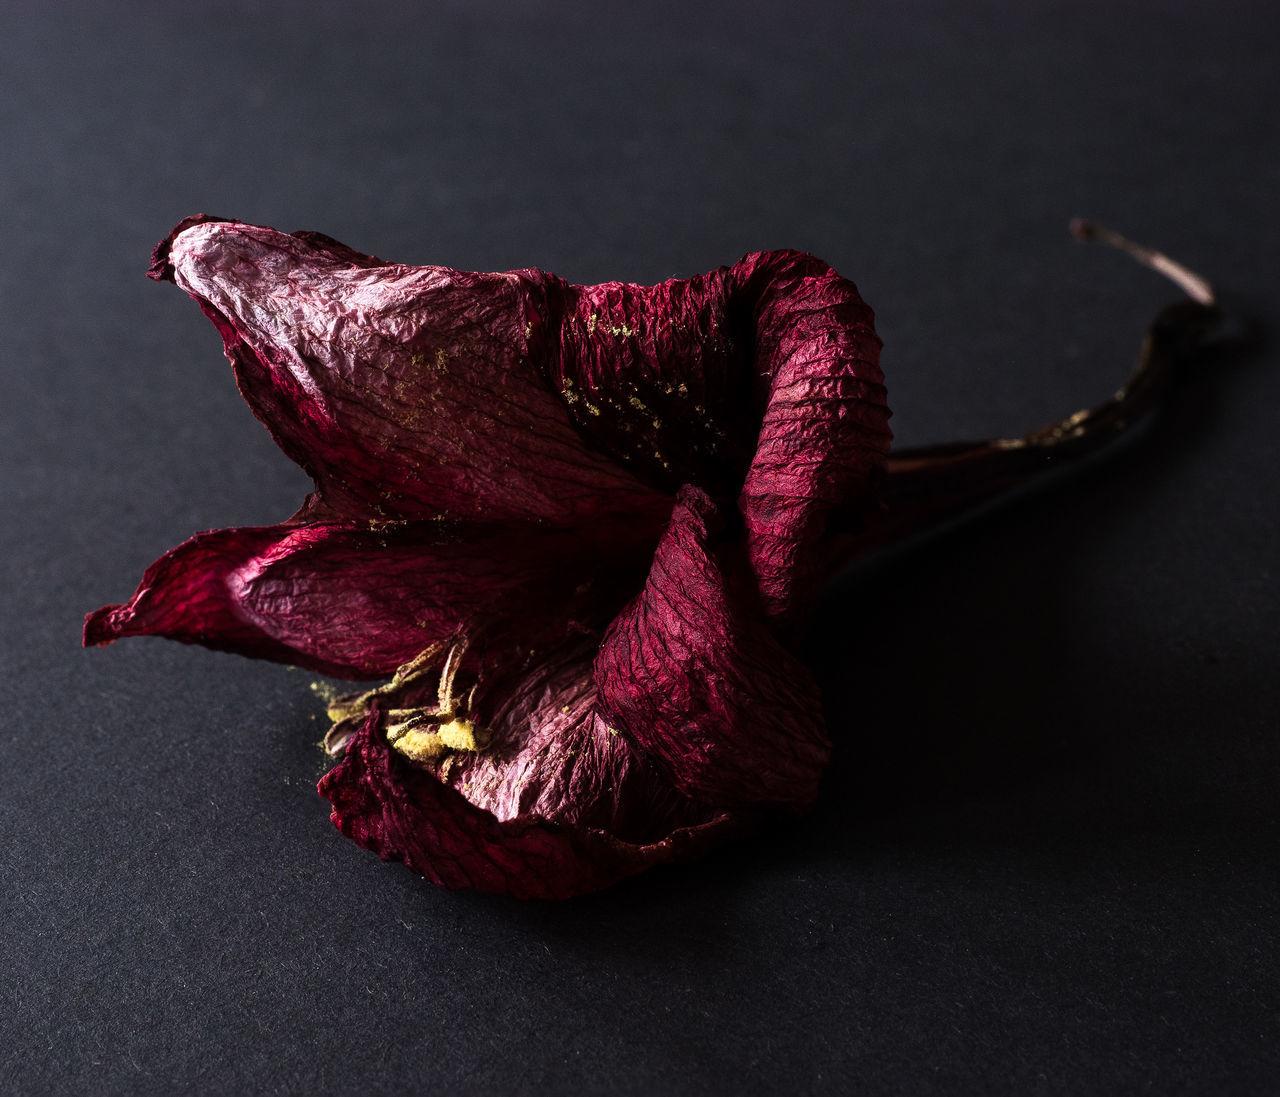 Amaryllis Flower Close-up Dark Dead Flower Dried Flowers Flower Gray Background No People Red Studio Shot